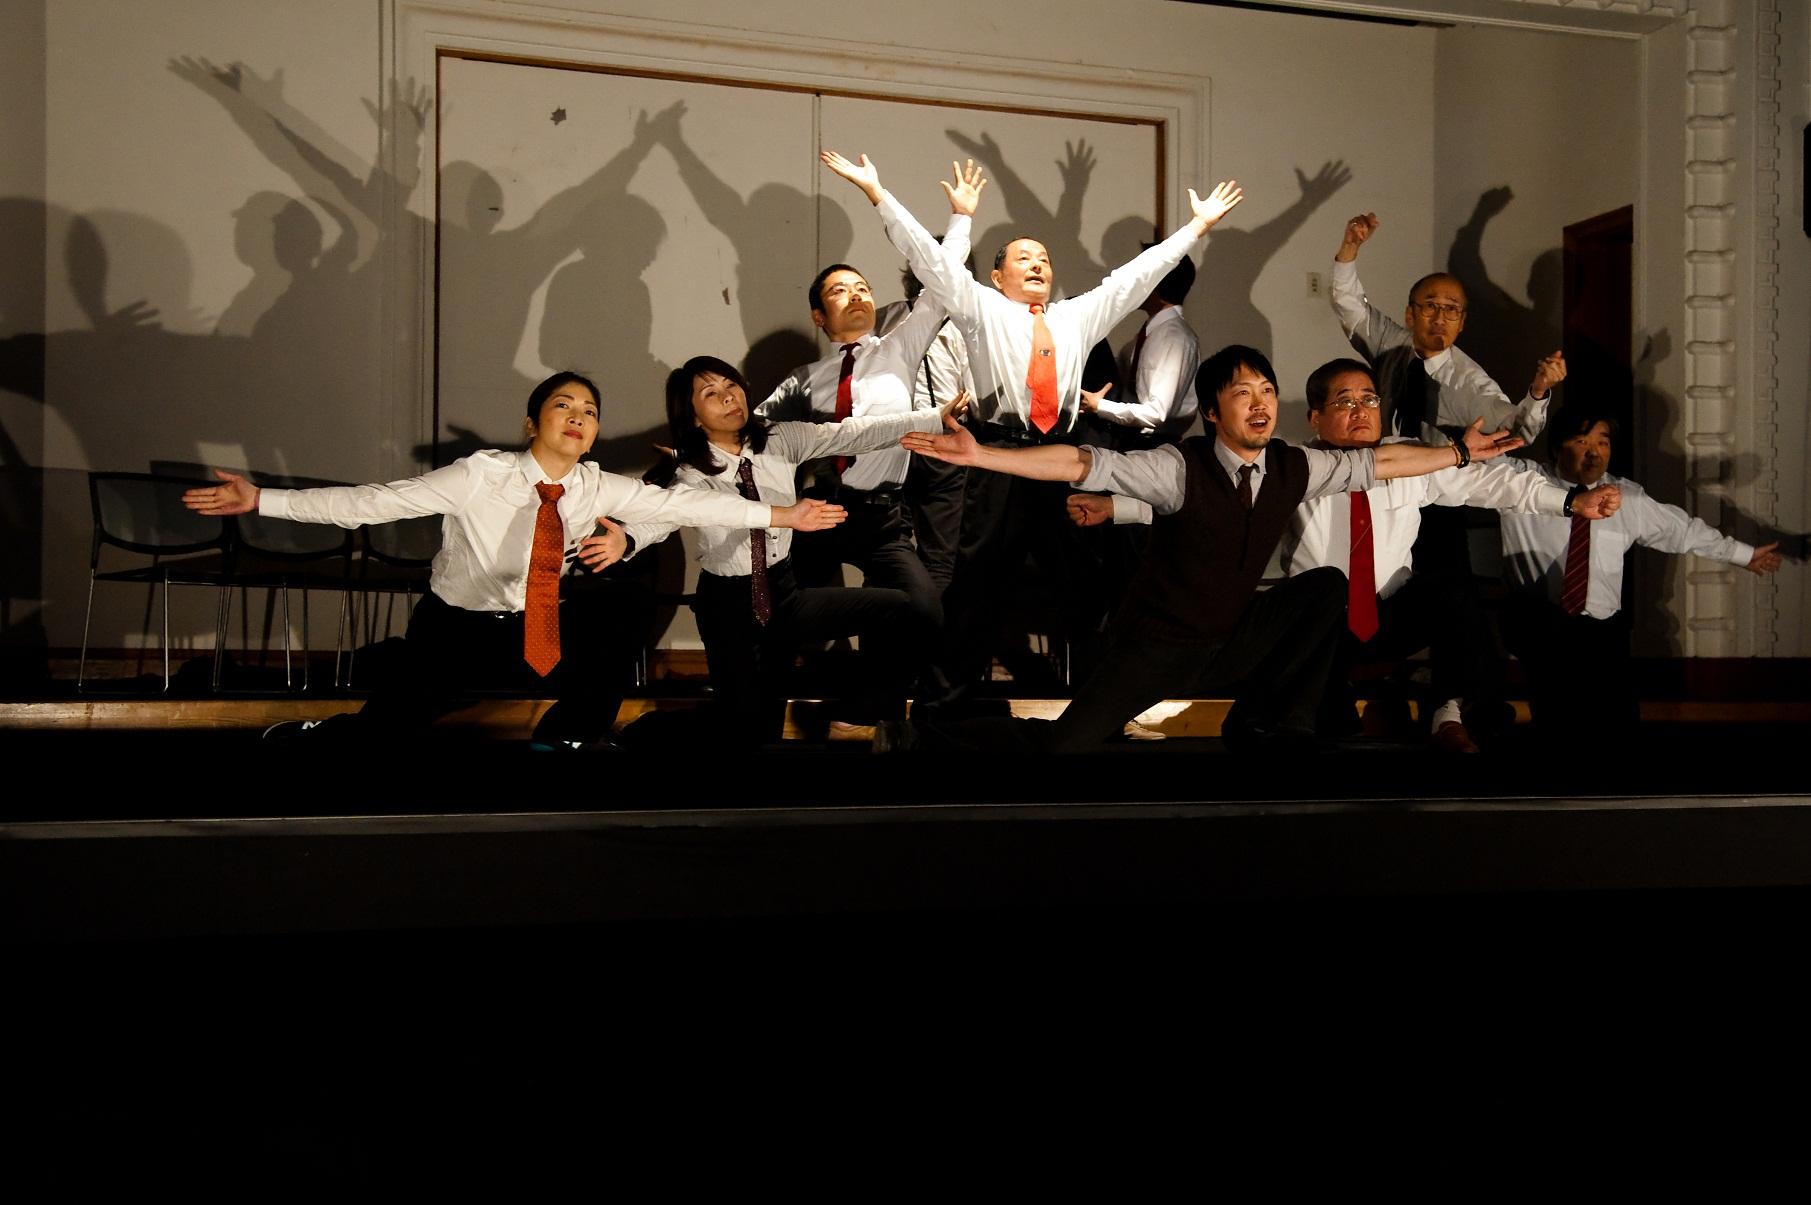 2011年度発表公演の様子 撮影:草本利枝